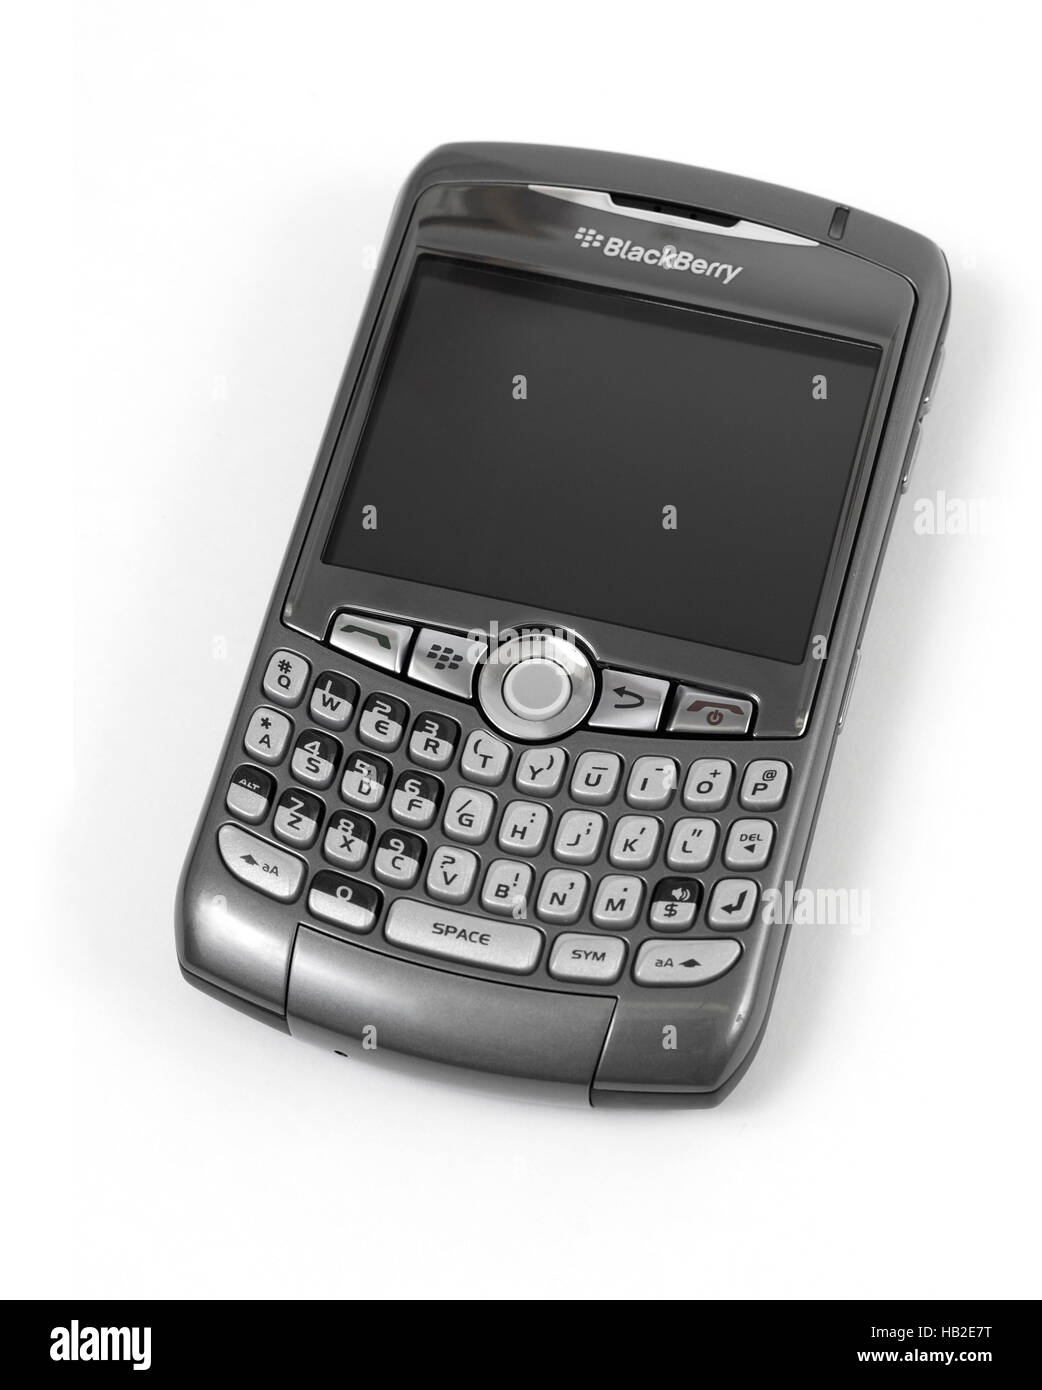 BlackBerry 8310 Curve, smartphone - Stock Image